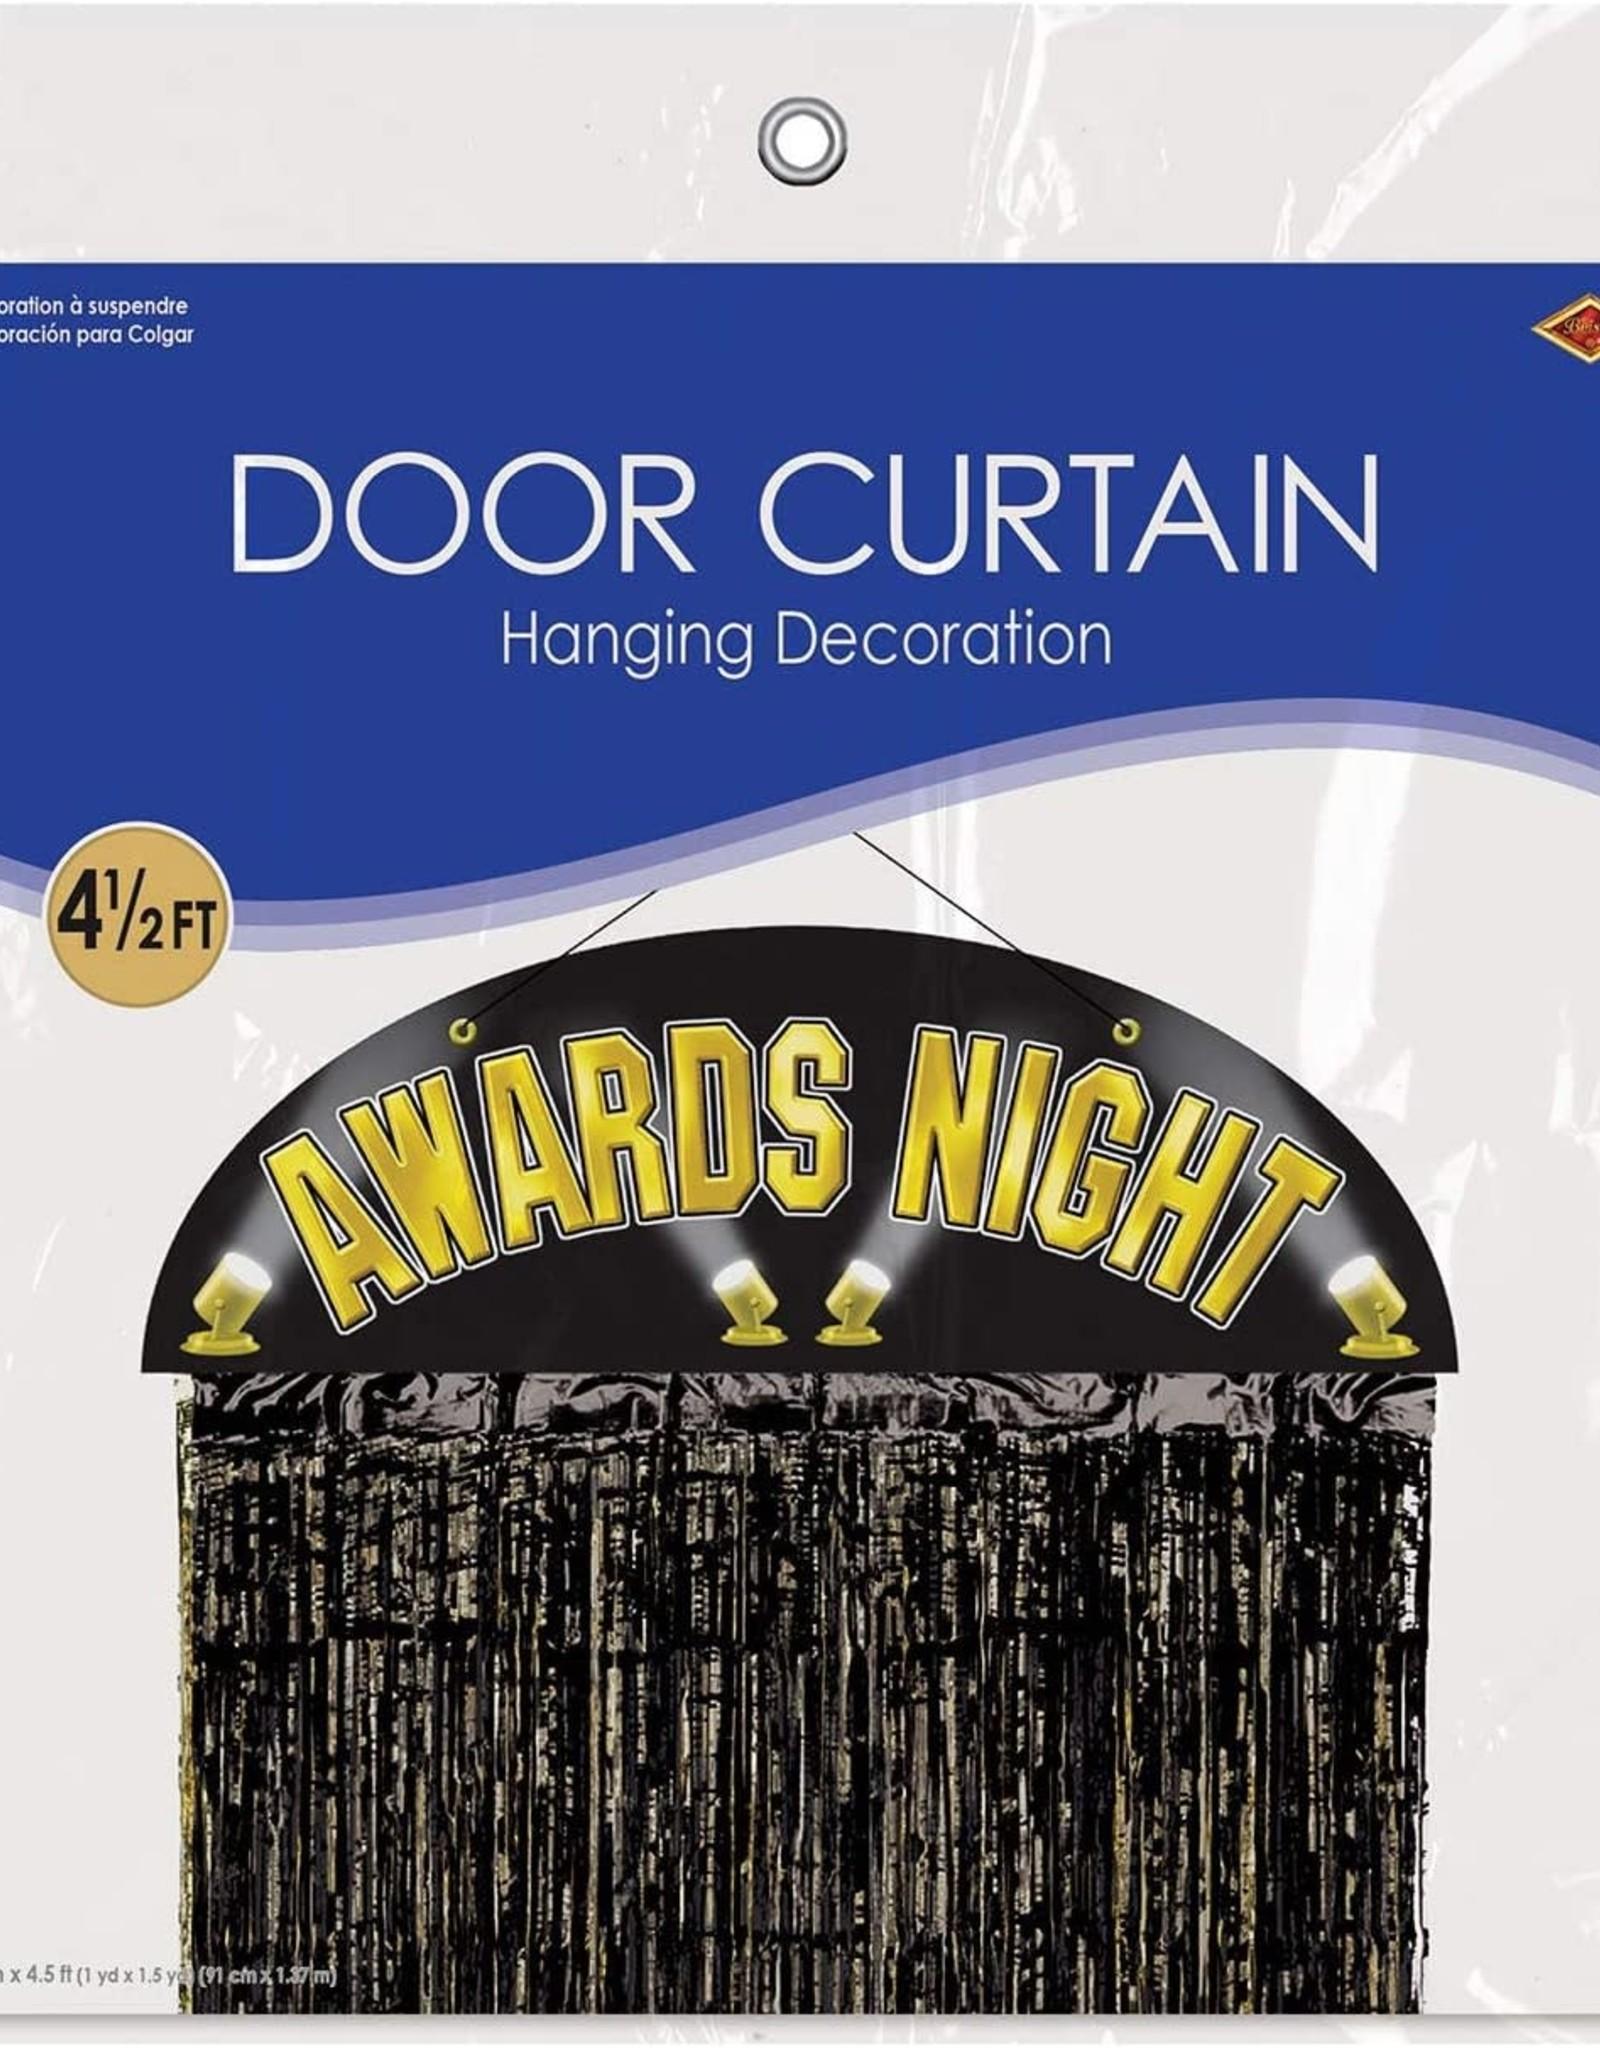 Awards Night Door Curtain